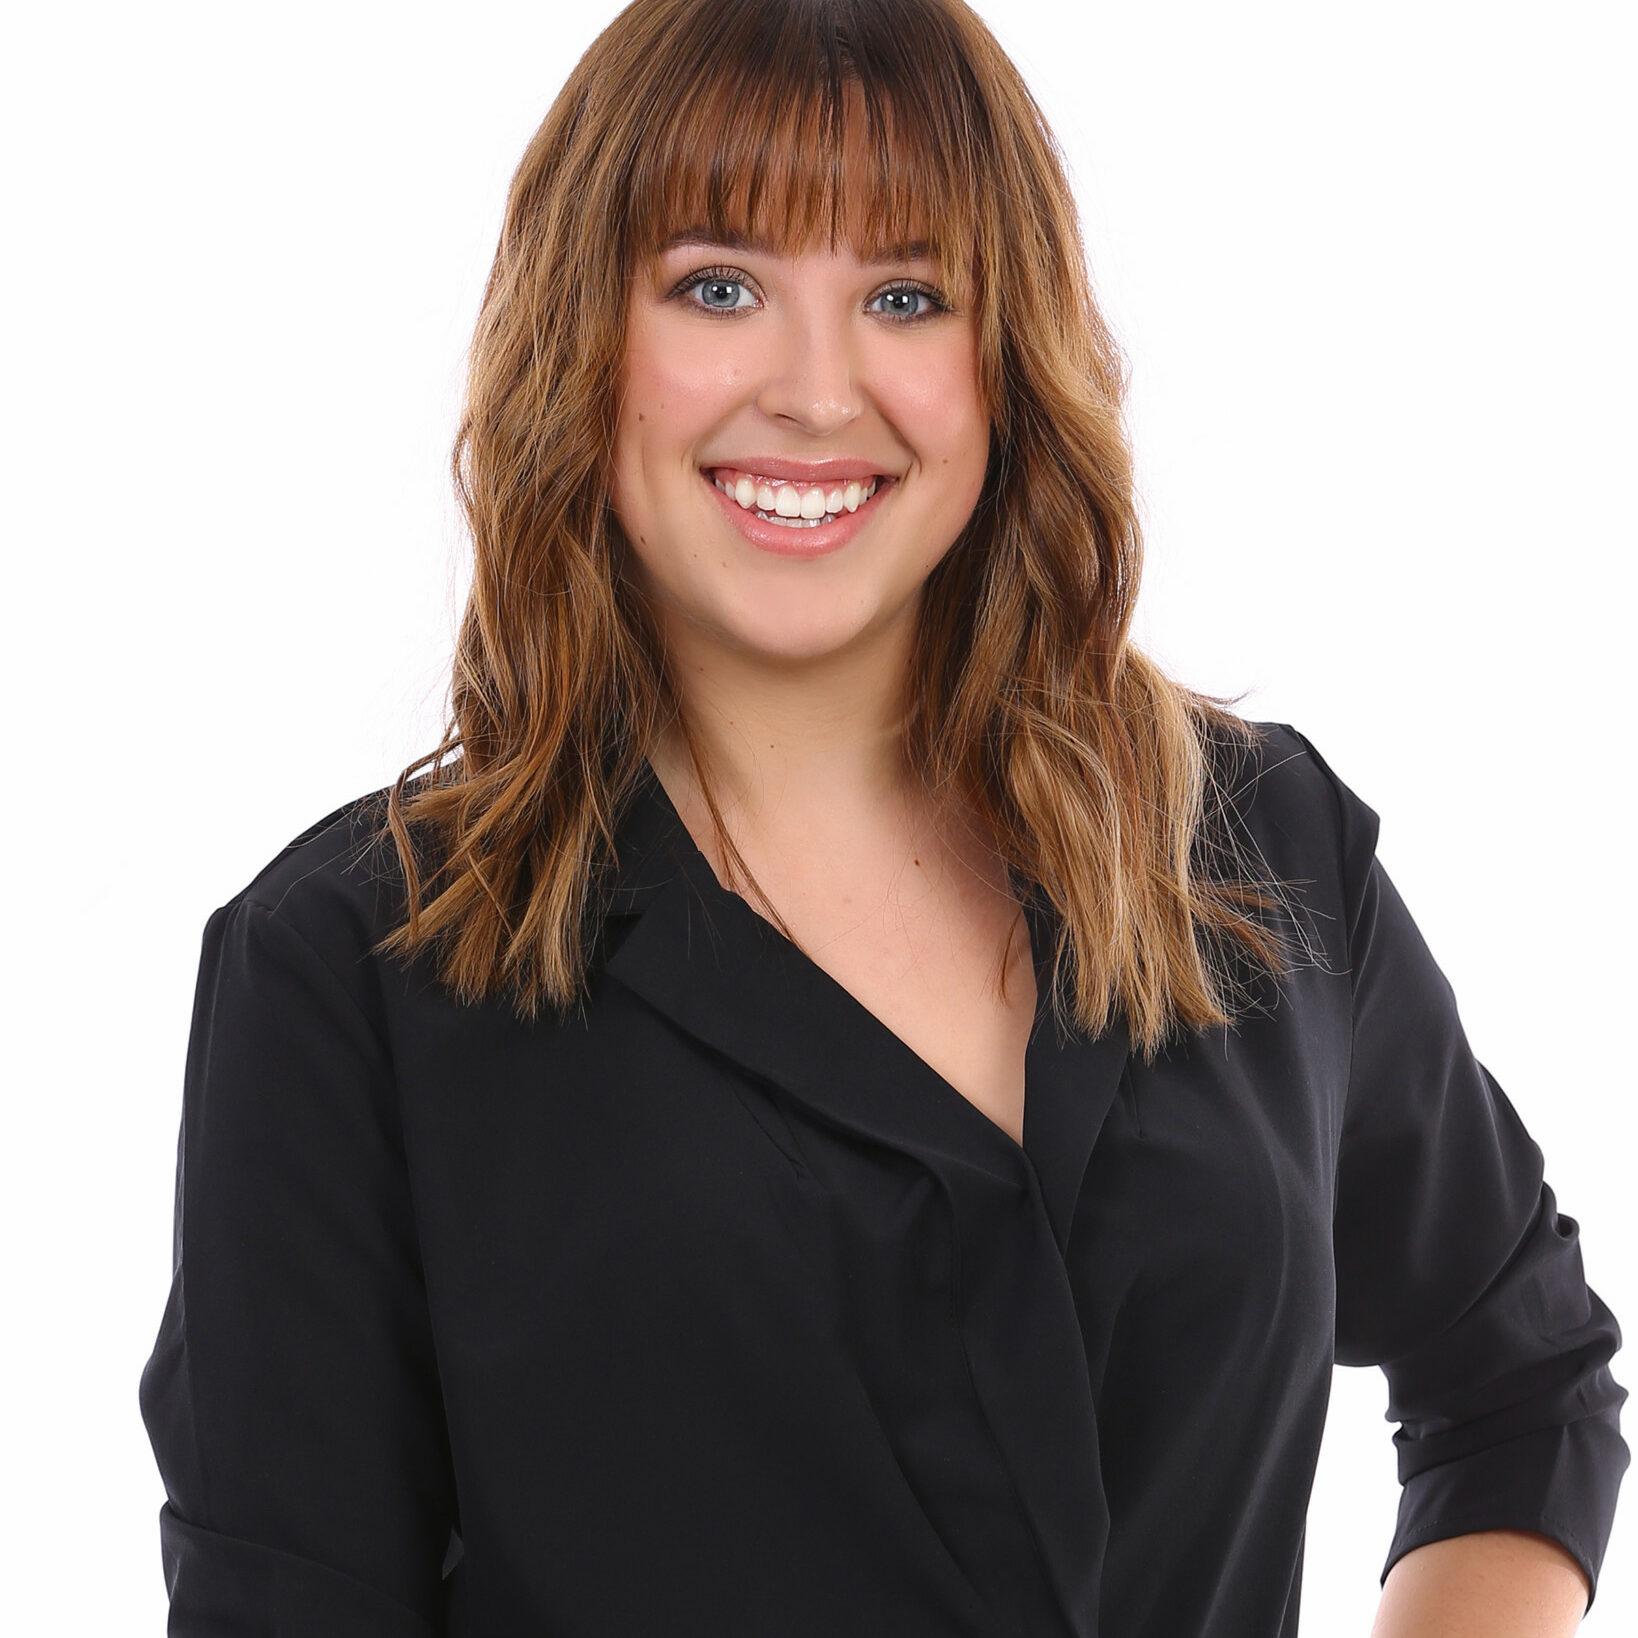 Katie Glenn